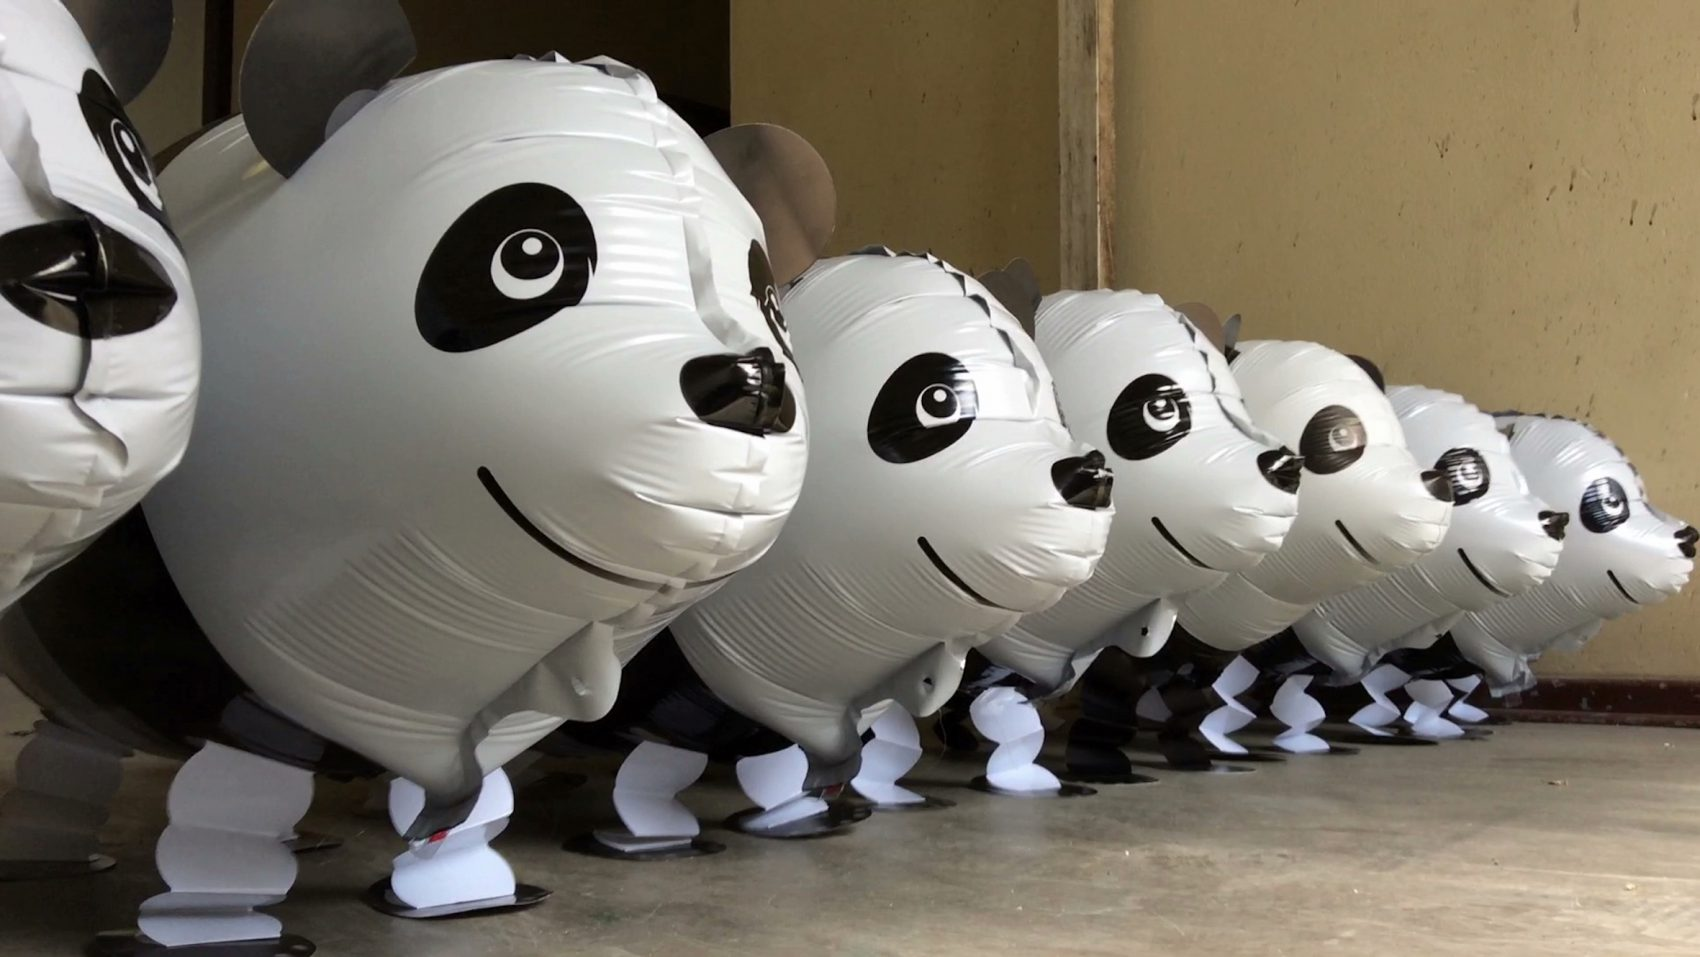 Panda Moonwalk or Why Meng Meng Walks Backwards